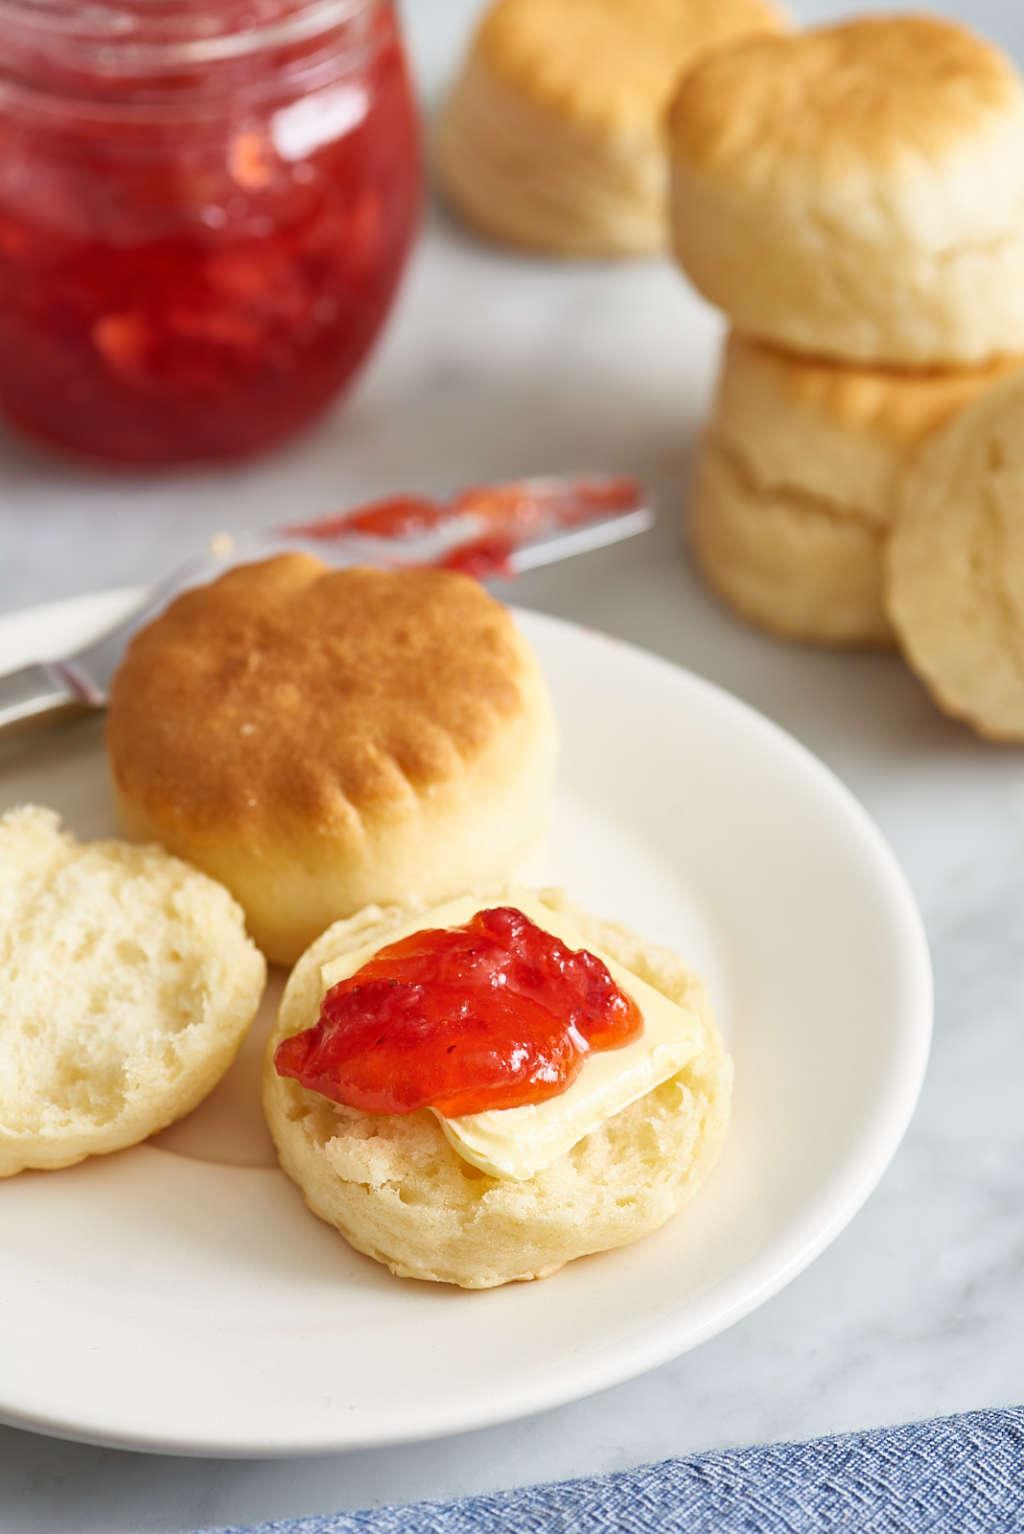 This Easy 4-Ingredient Strawberry Jam Requires Zero Cooking